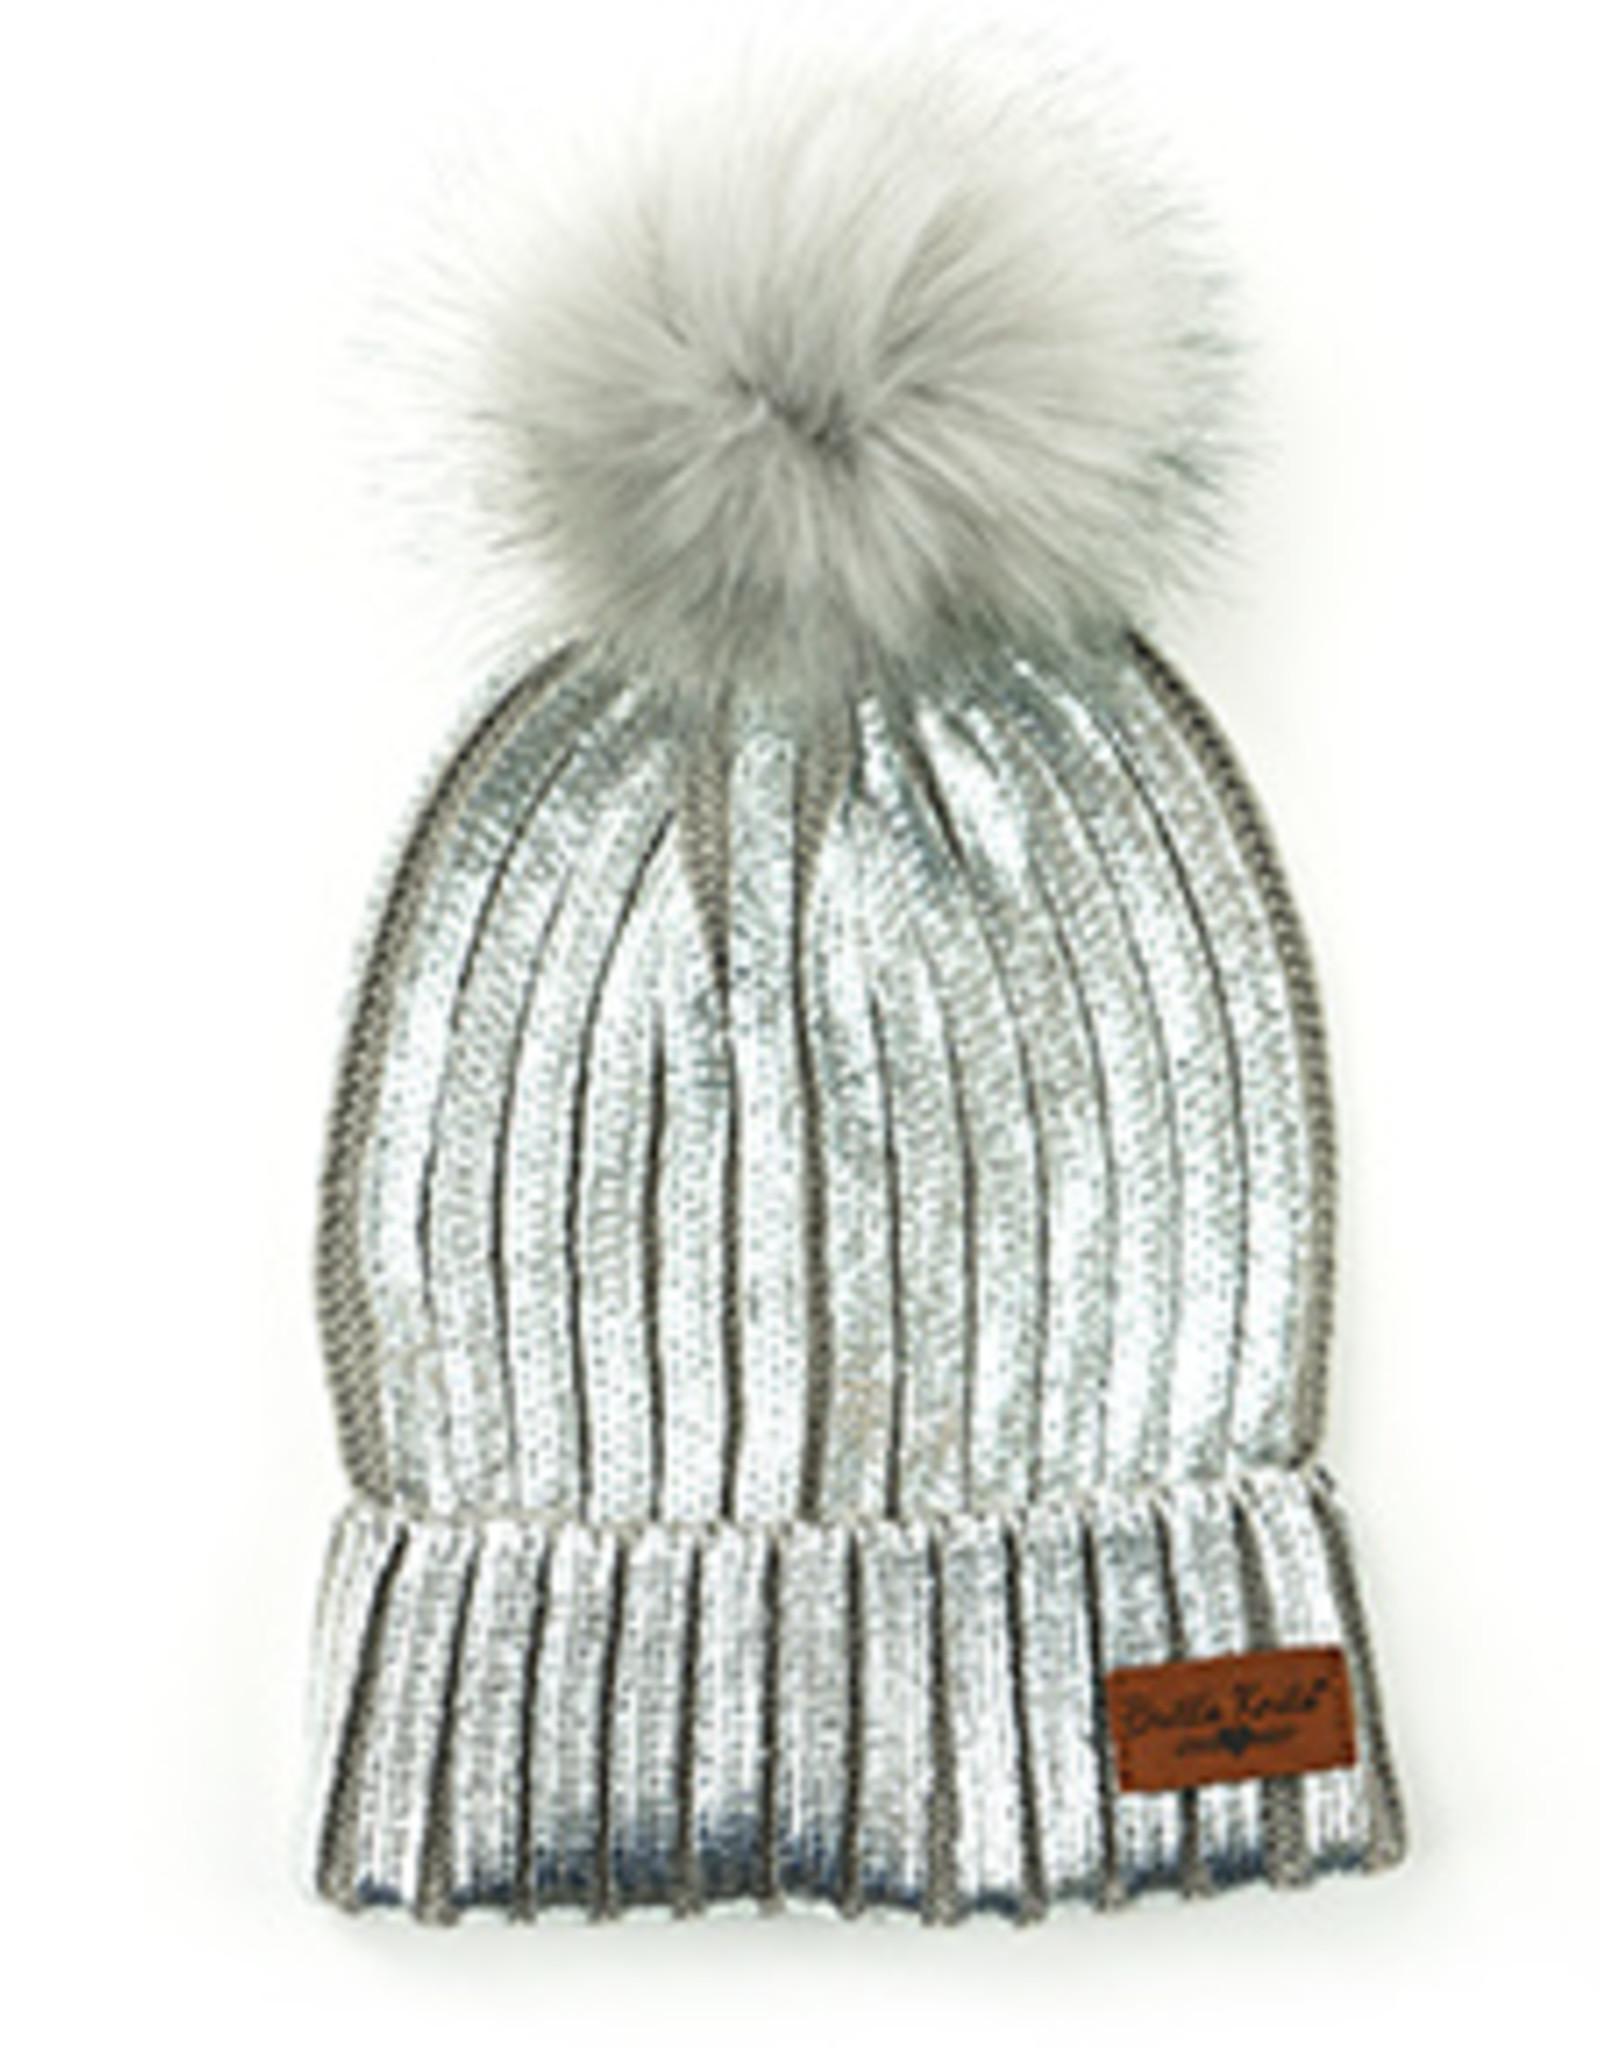 Britts Knits - Glacier Knit Pom Hat